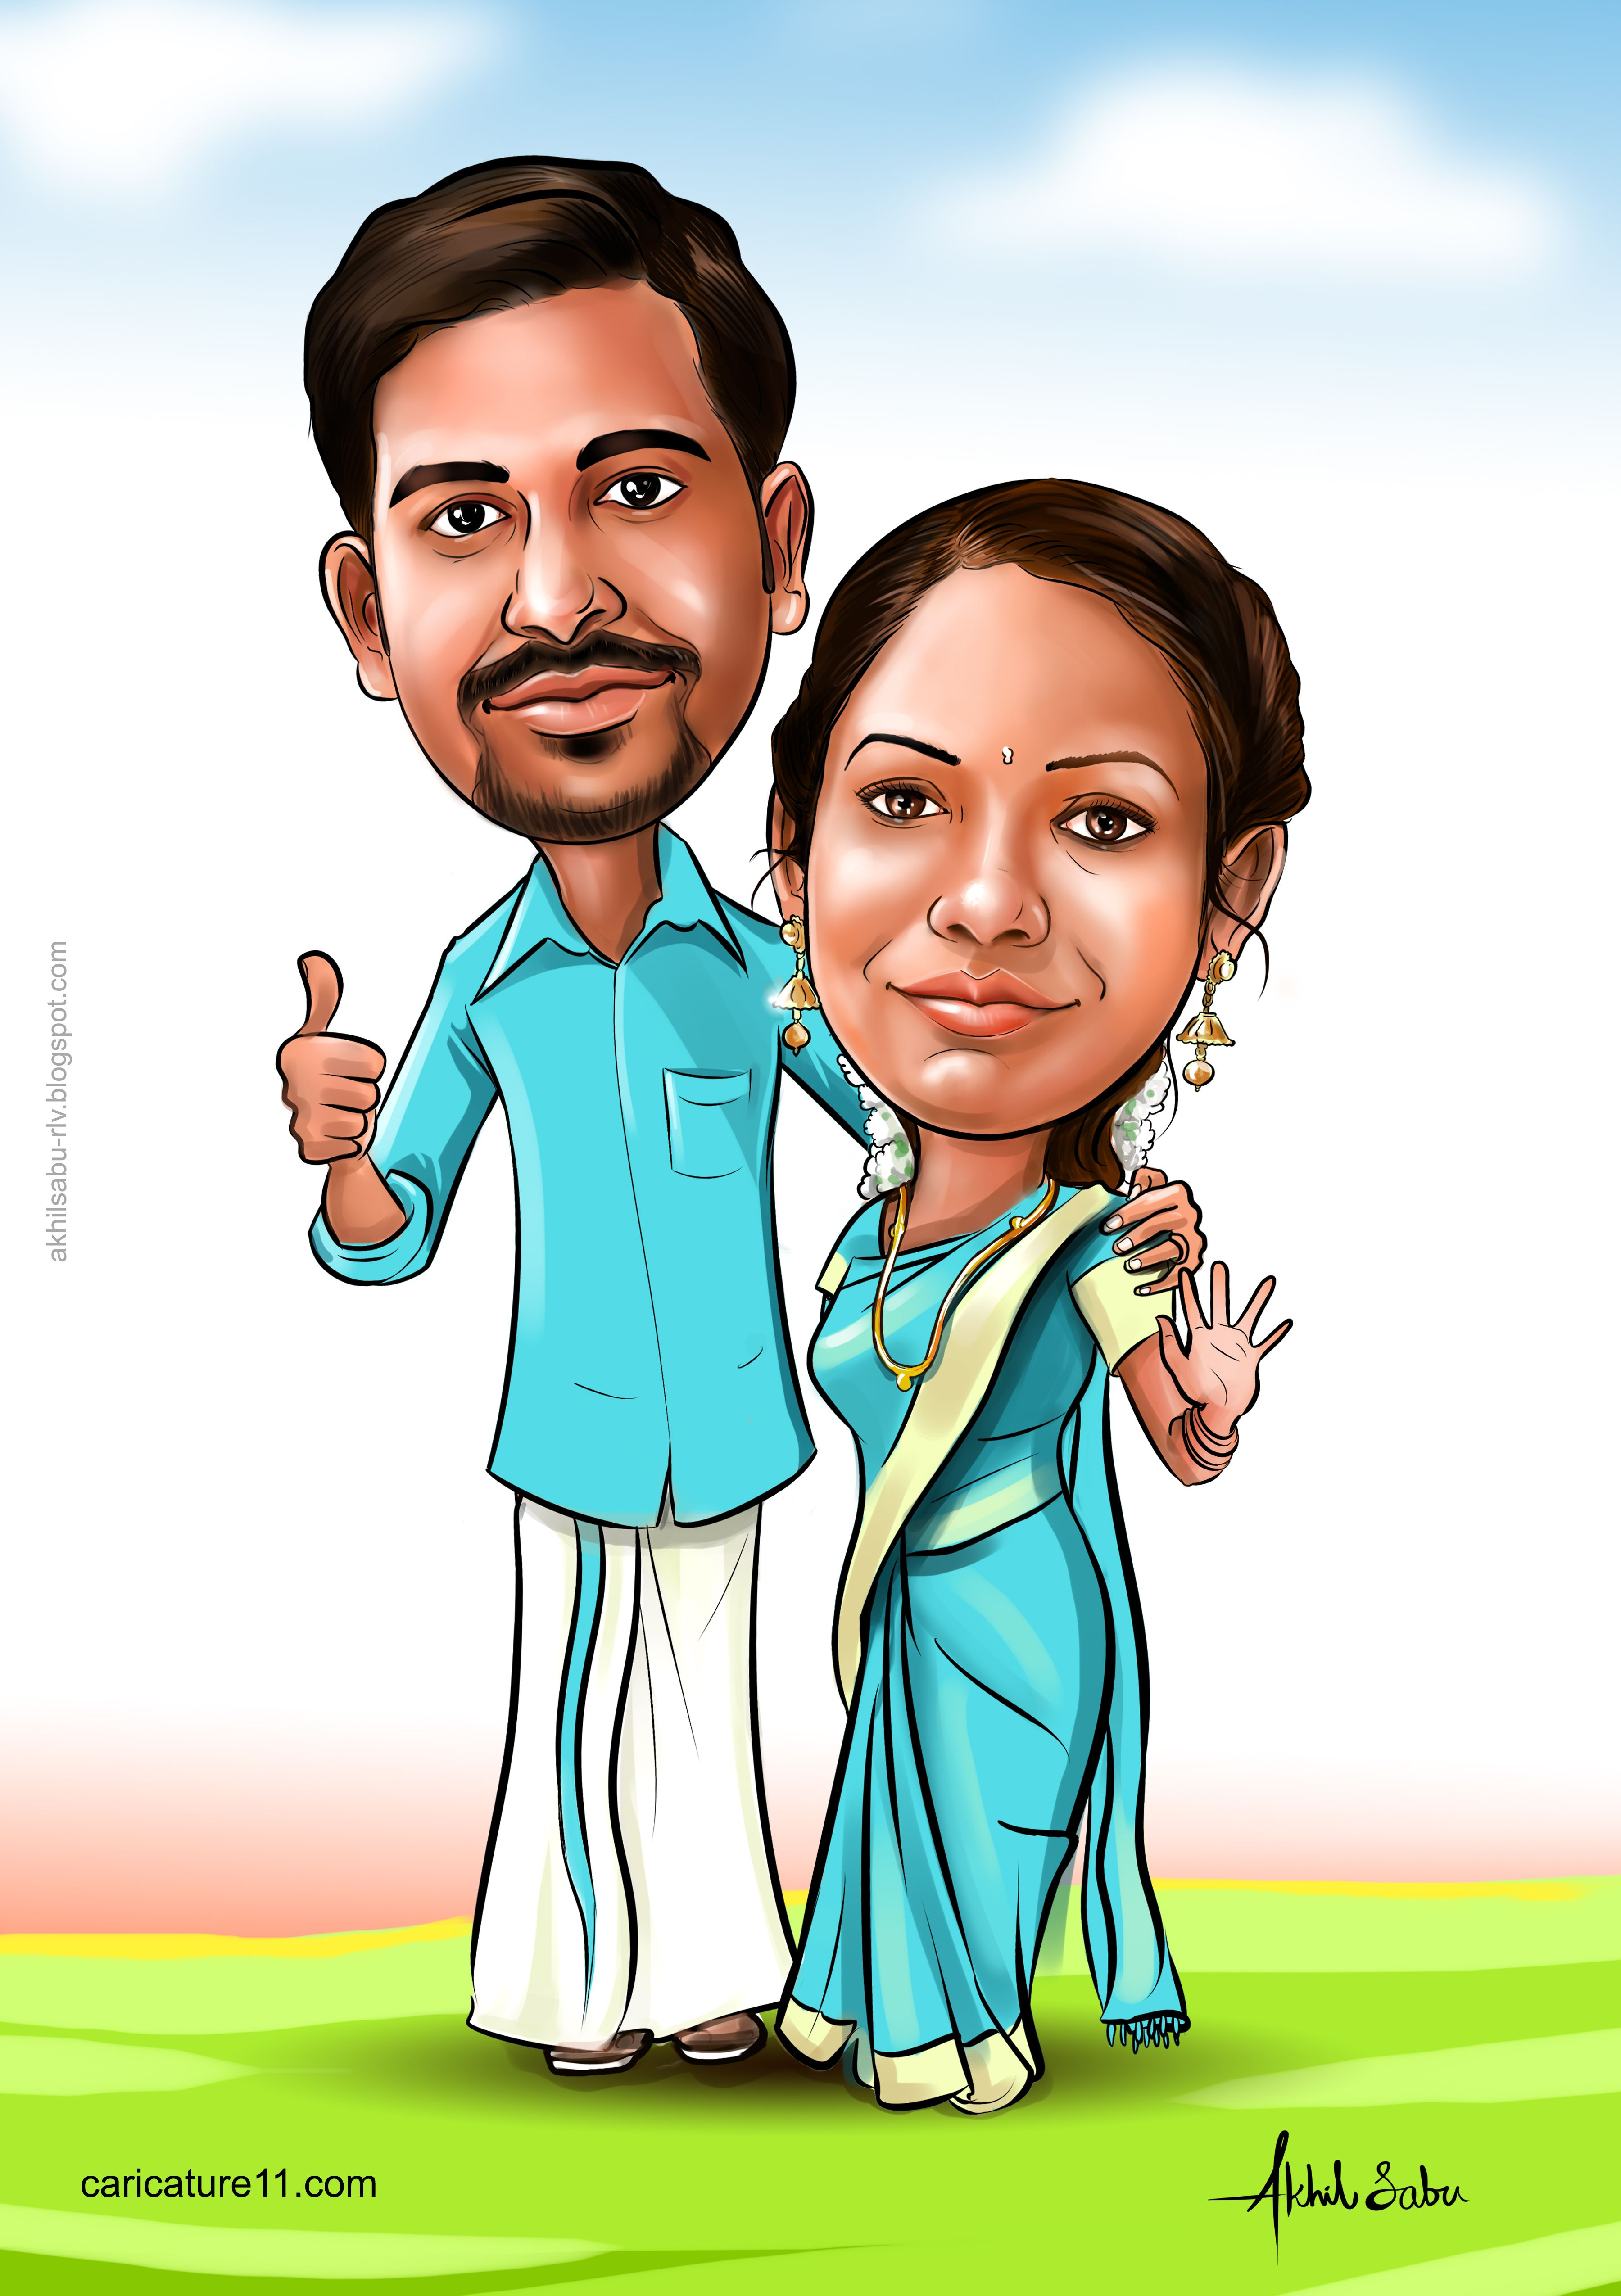 India wedding caricature wedding caricature caricature